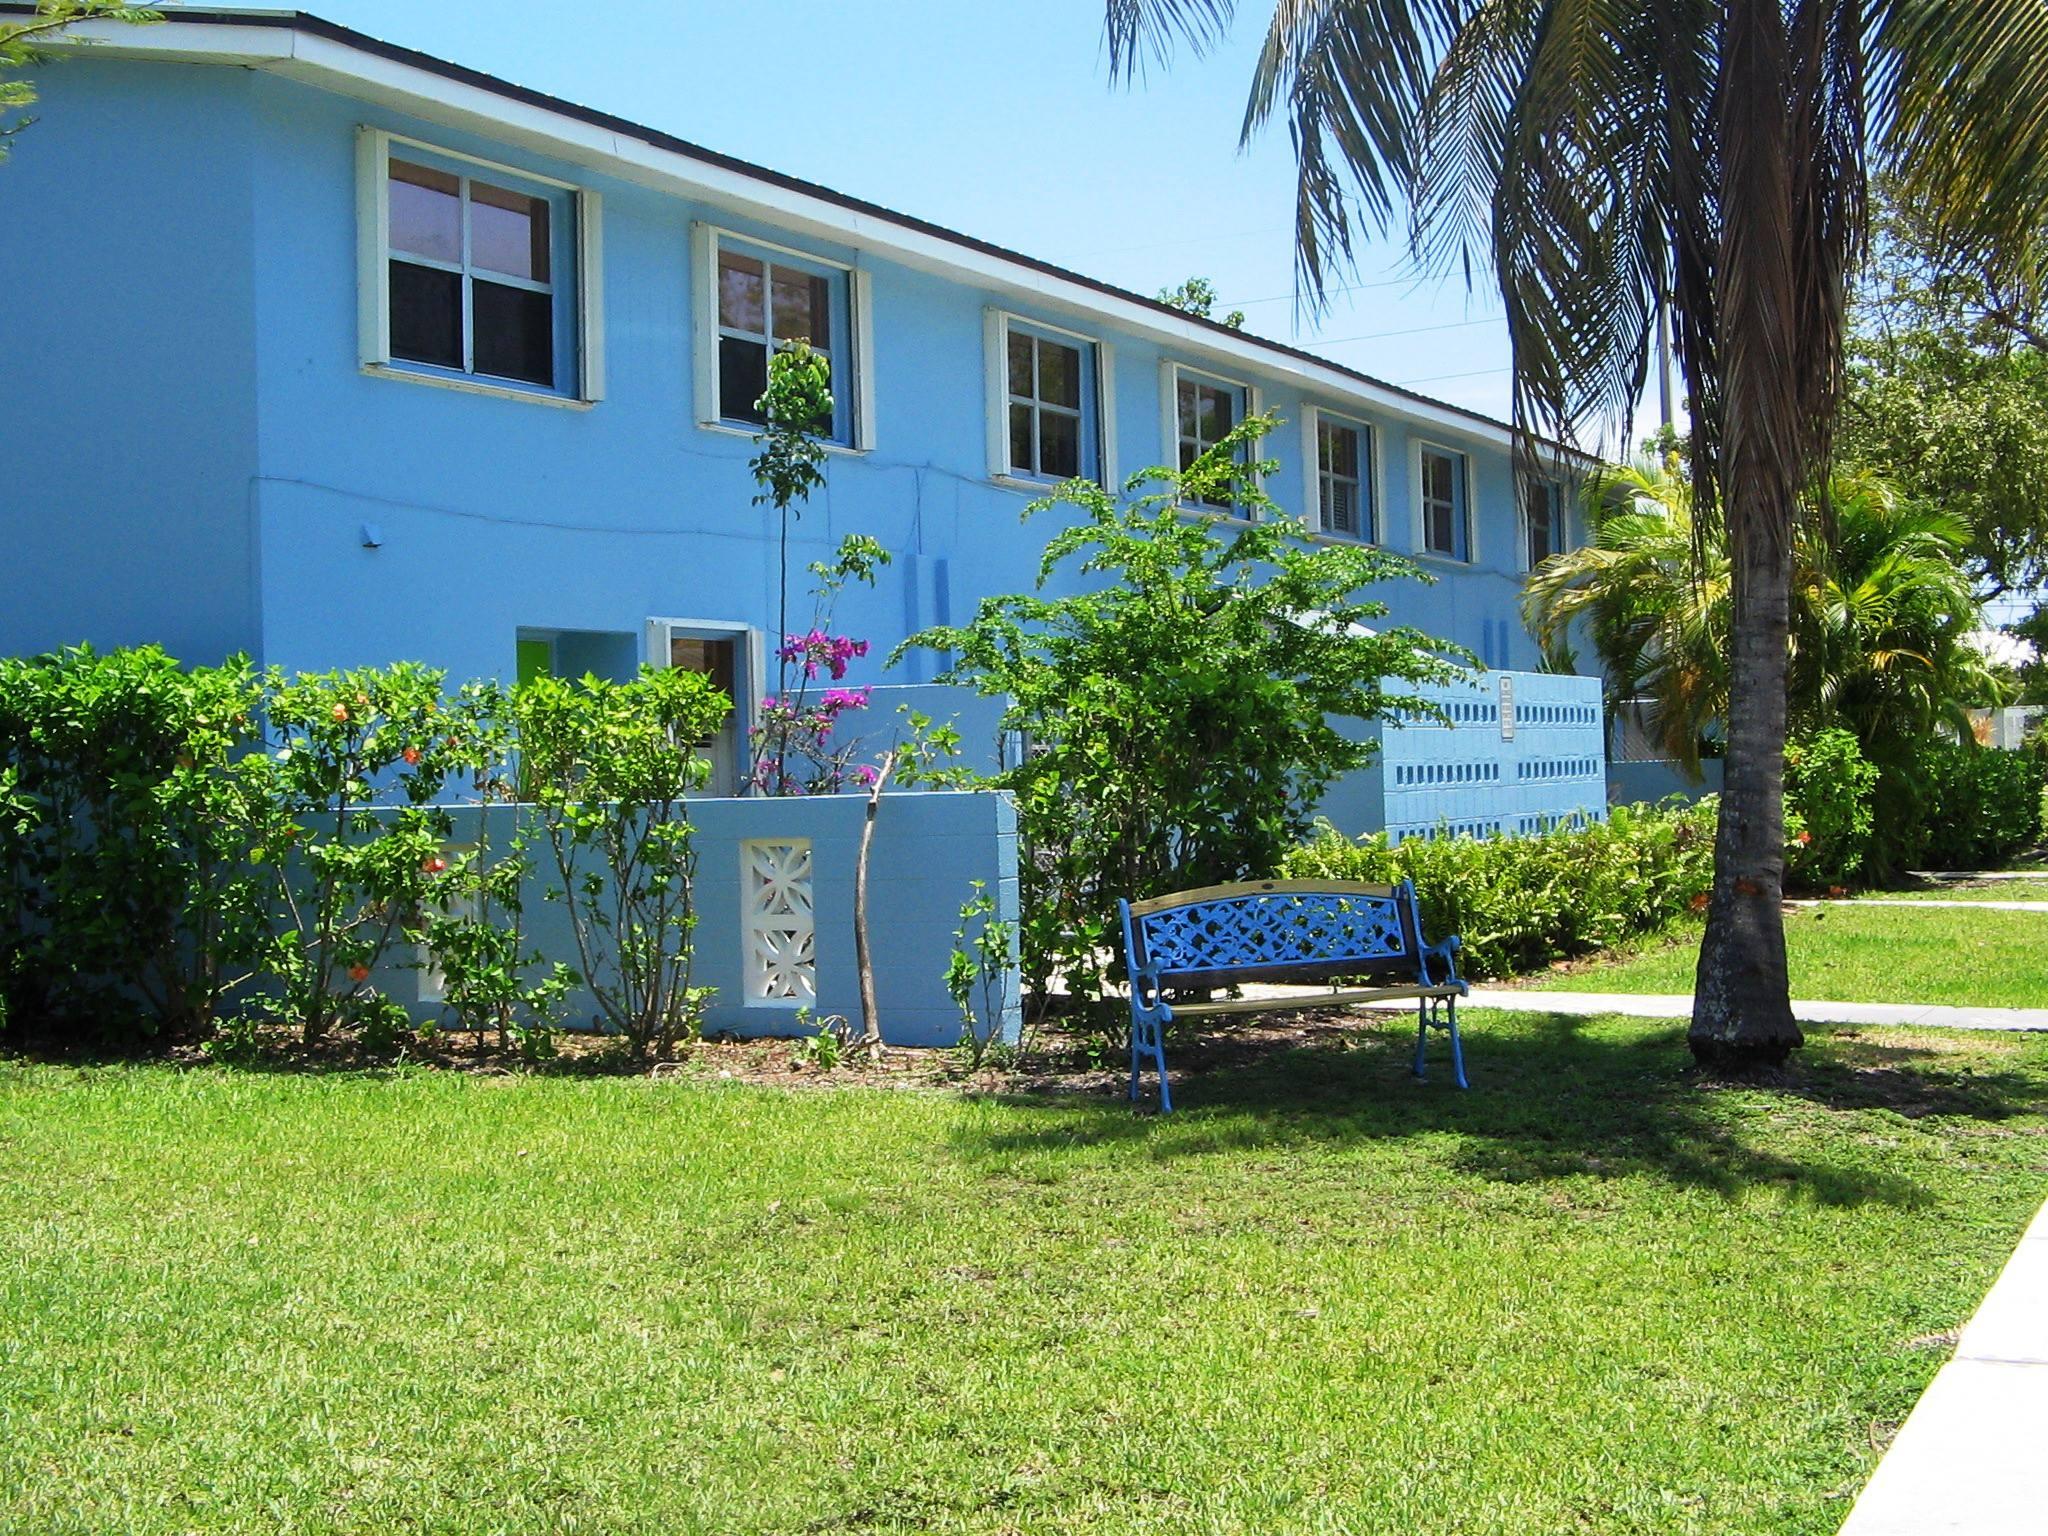 Key West Florida Homeless Shelter List